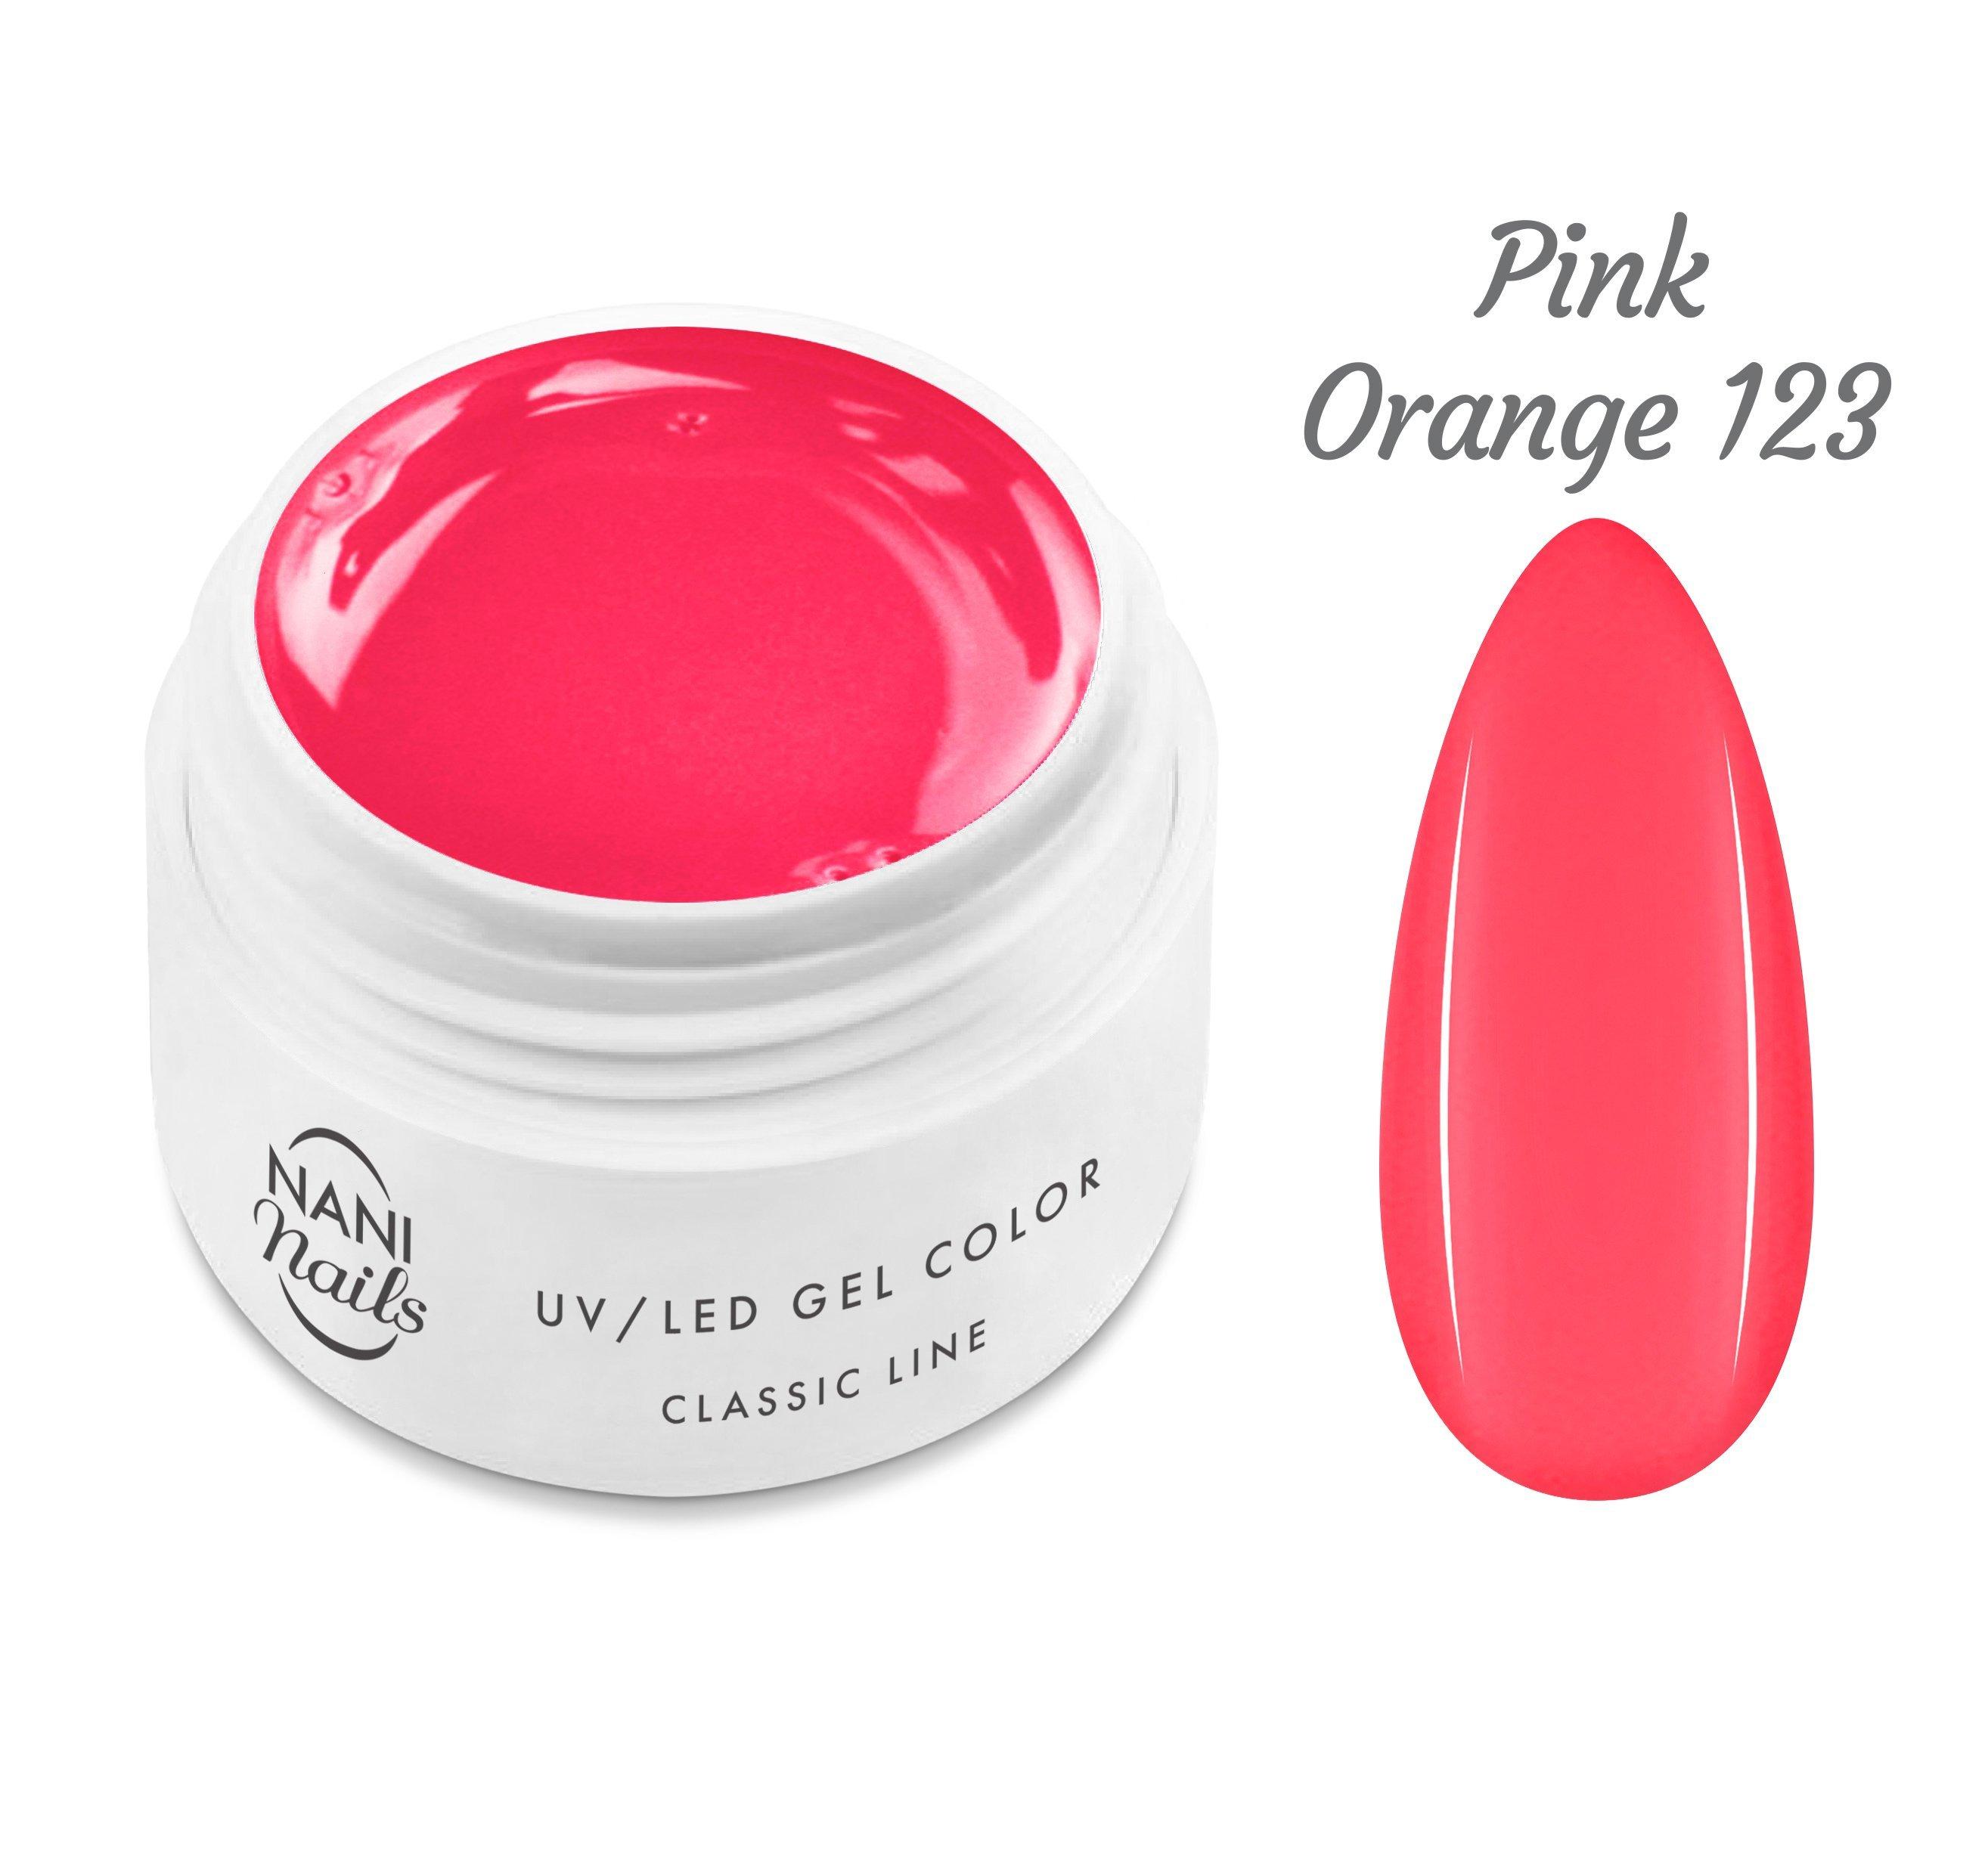 NANI UV gél Classic Neon Line 5 ml - Pink Orange